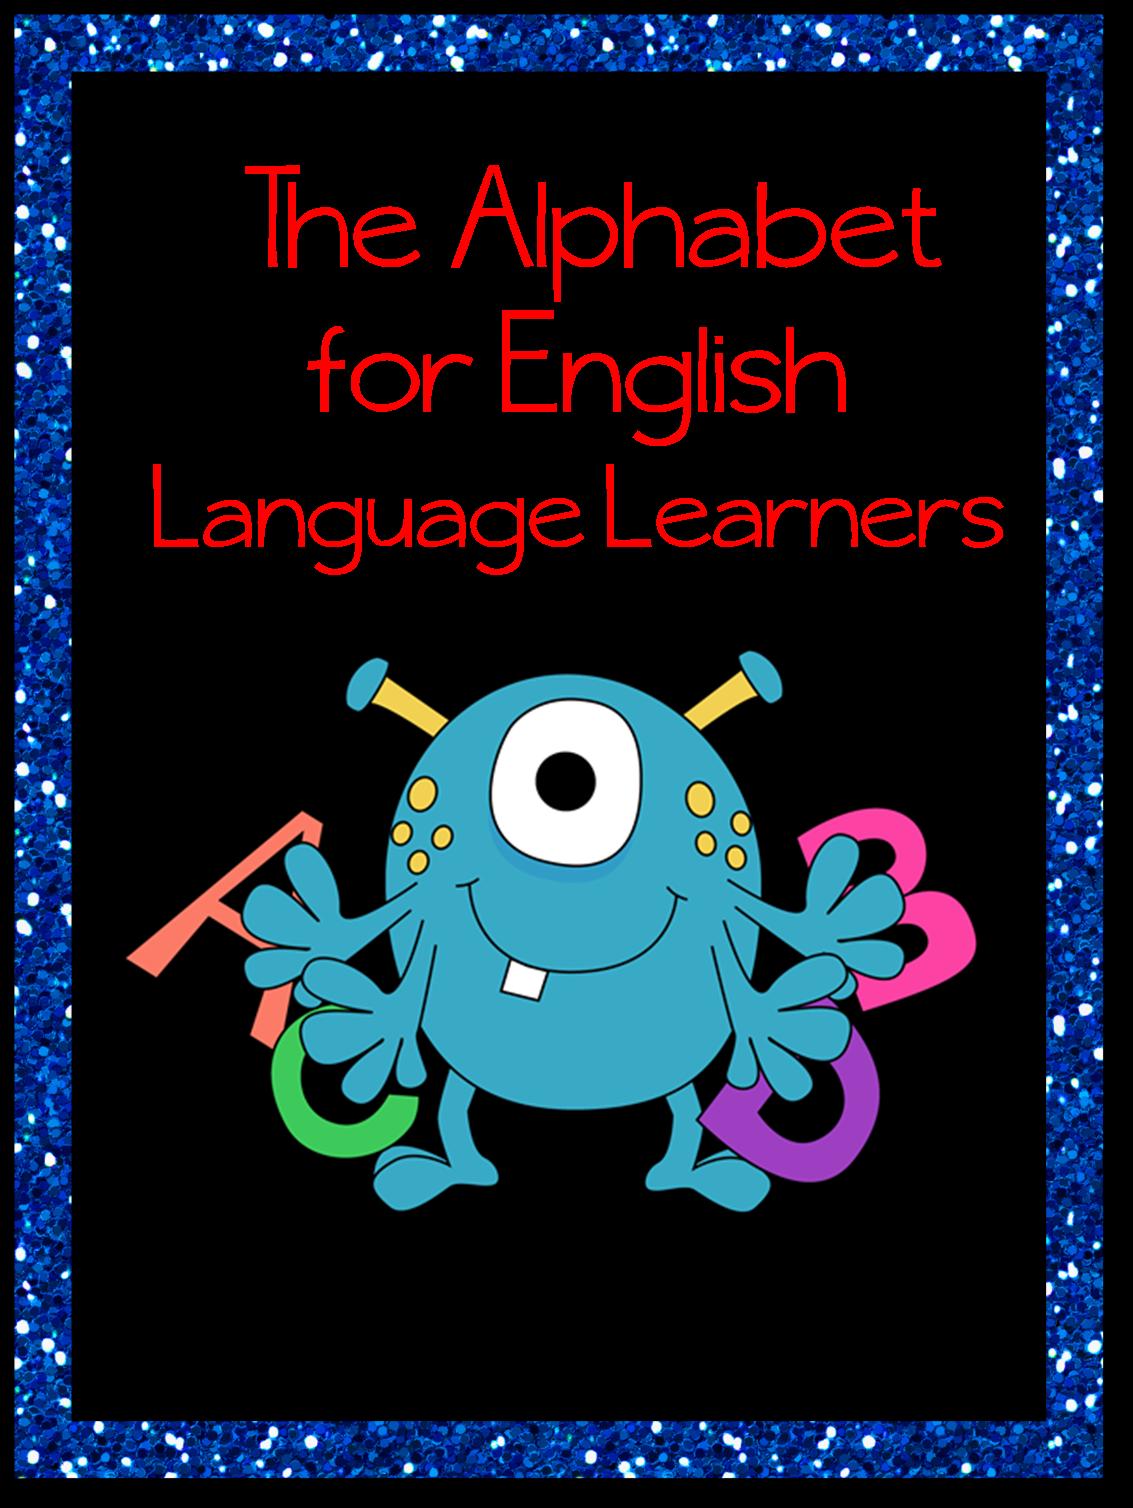 ESL/EFL Preschool Teachers: January 2016